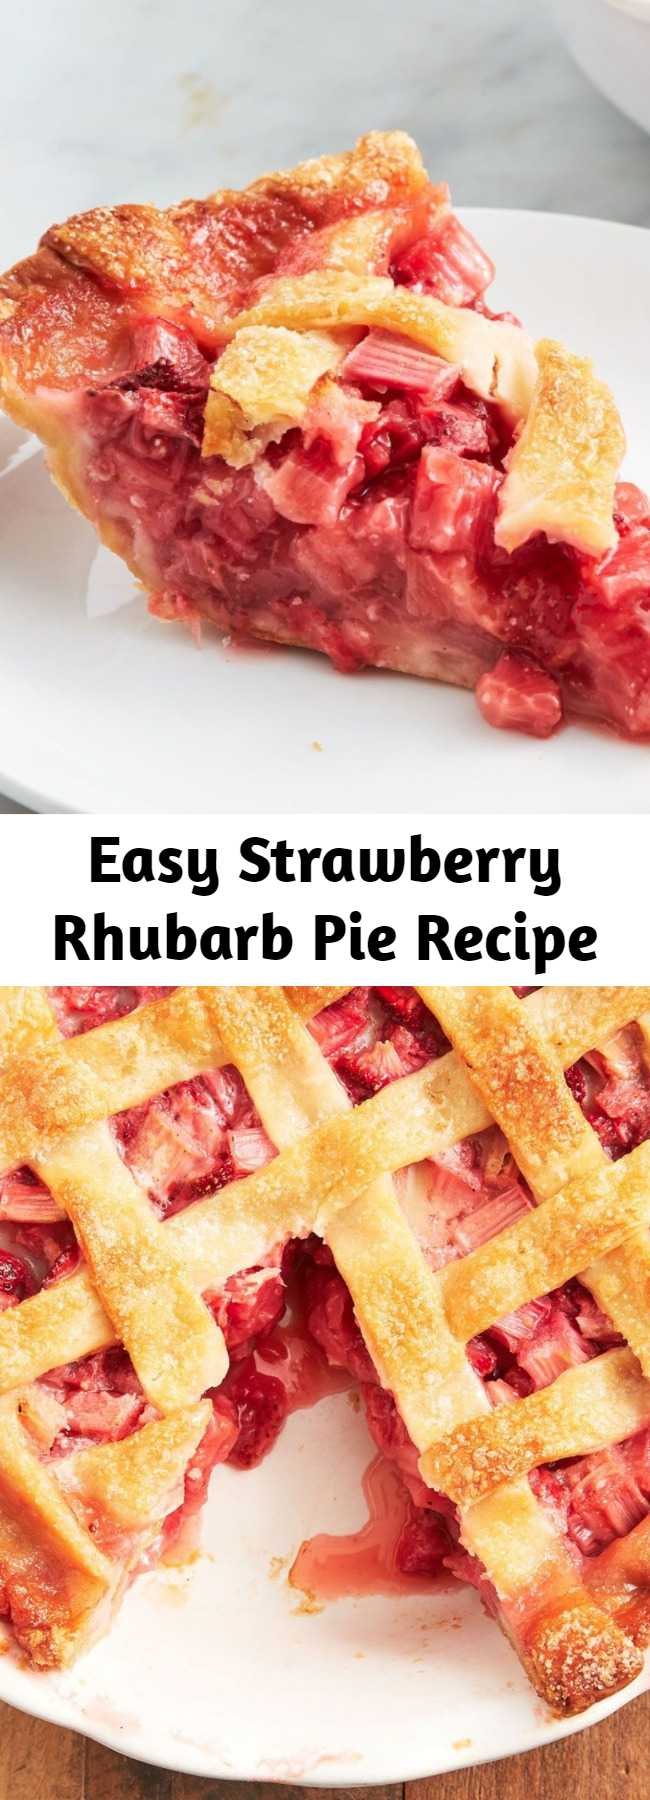 Easy Strawberry Rhubarb Pie Recipe - Strawberry rhubarb pie just got a lot easier!